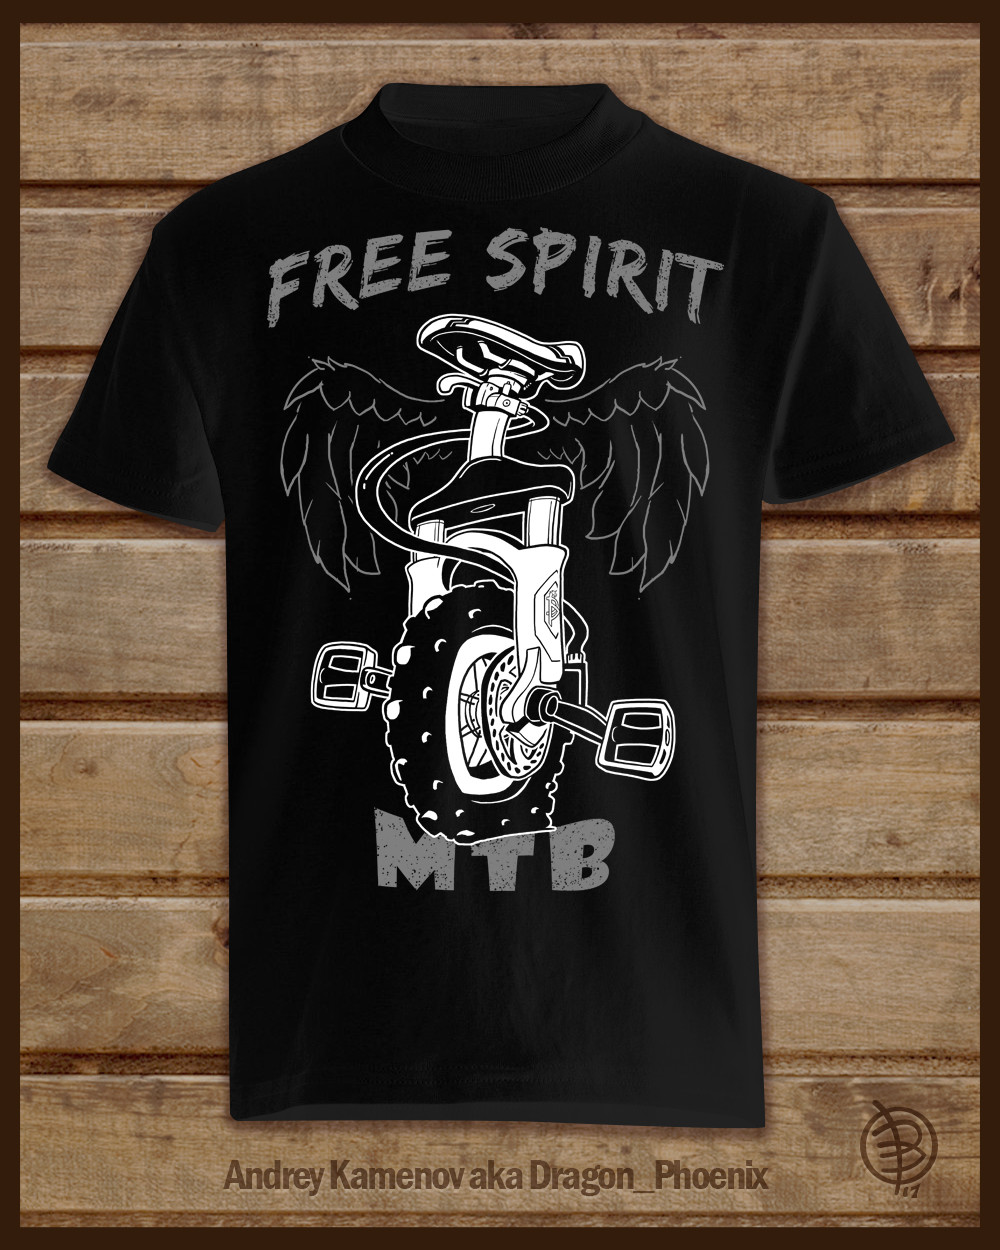 Andrey kamenov 01 mockup freespirit monocycle 03